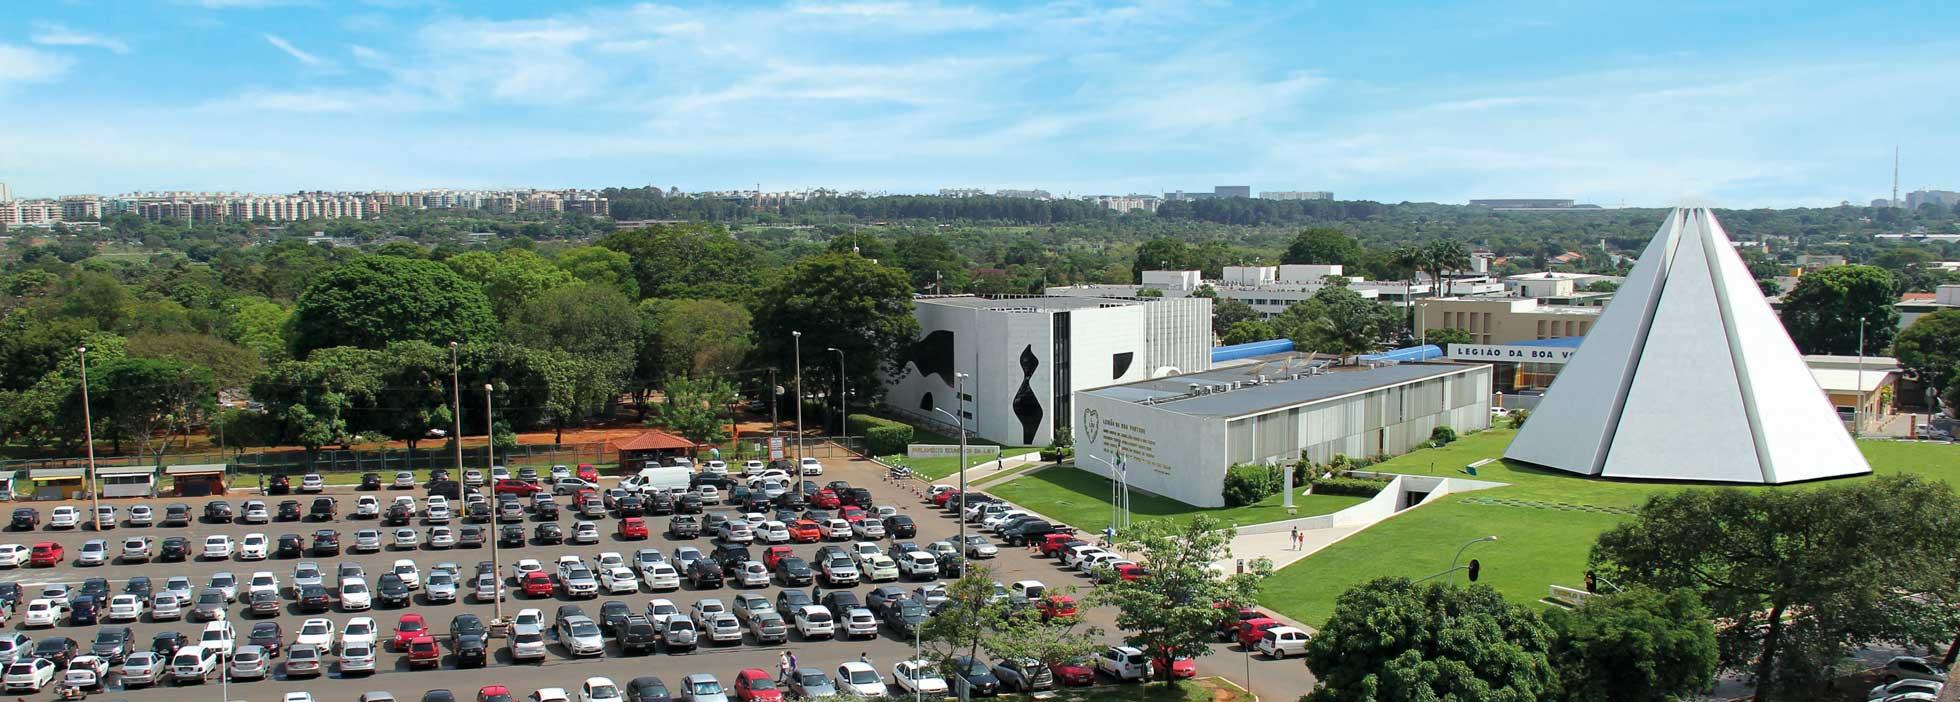 Templo da Boa Vontade - Brasília, DF